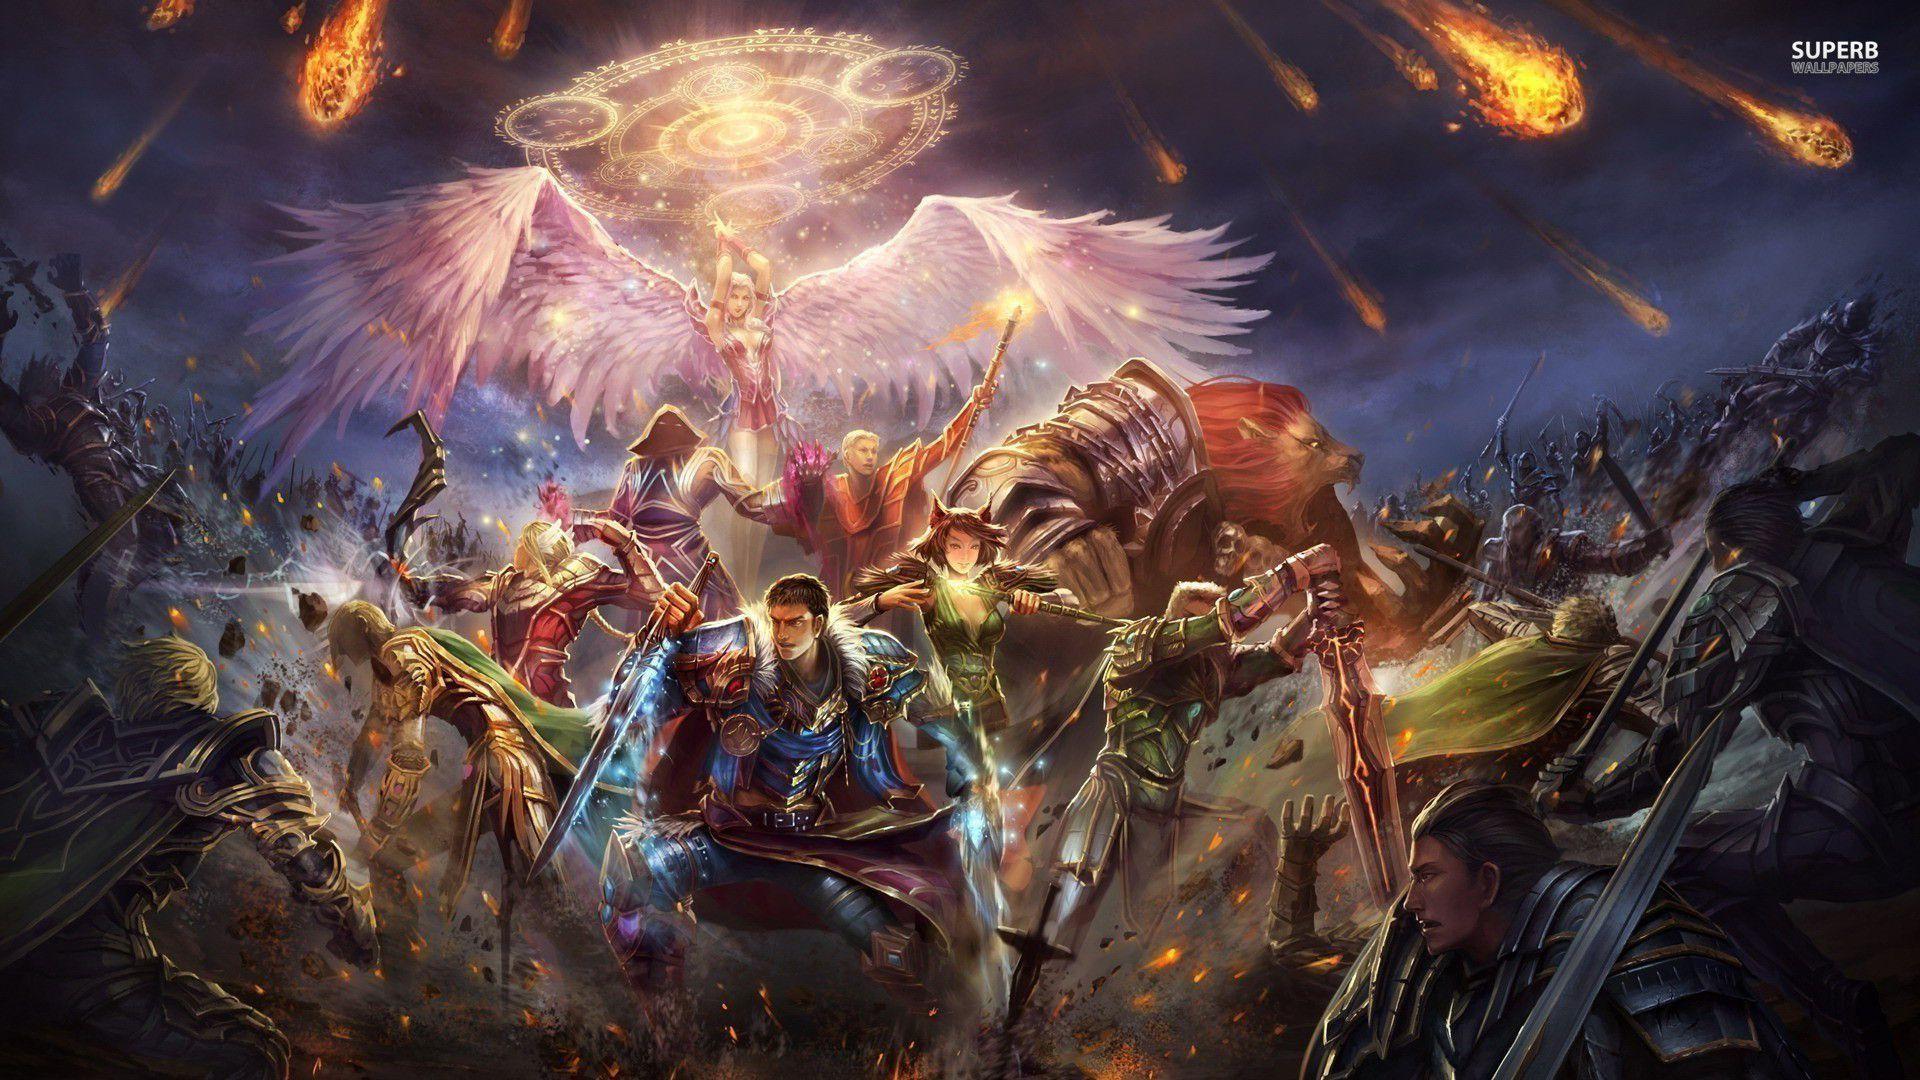 Epic battle wallpaper – Fantasy wallpapers – #